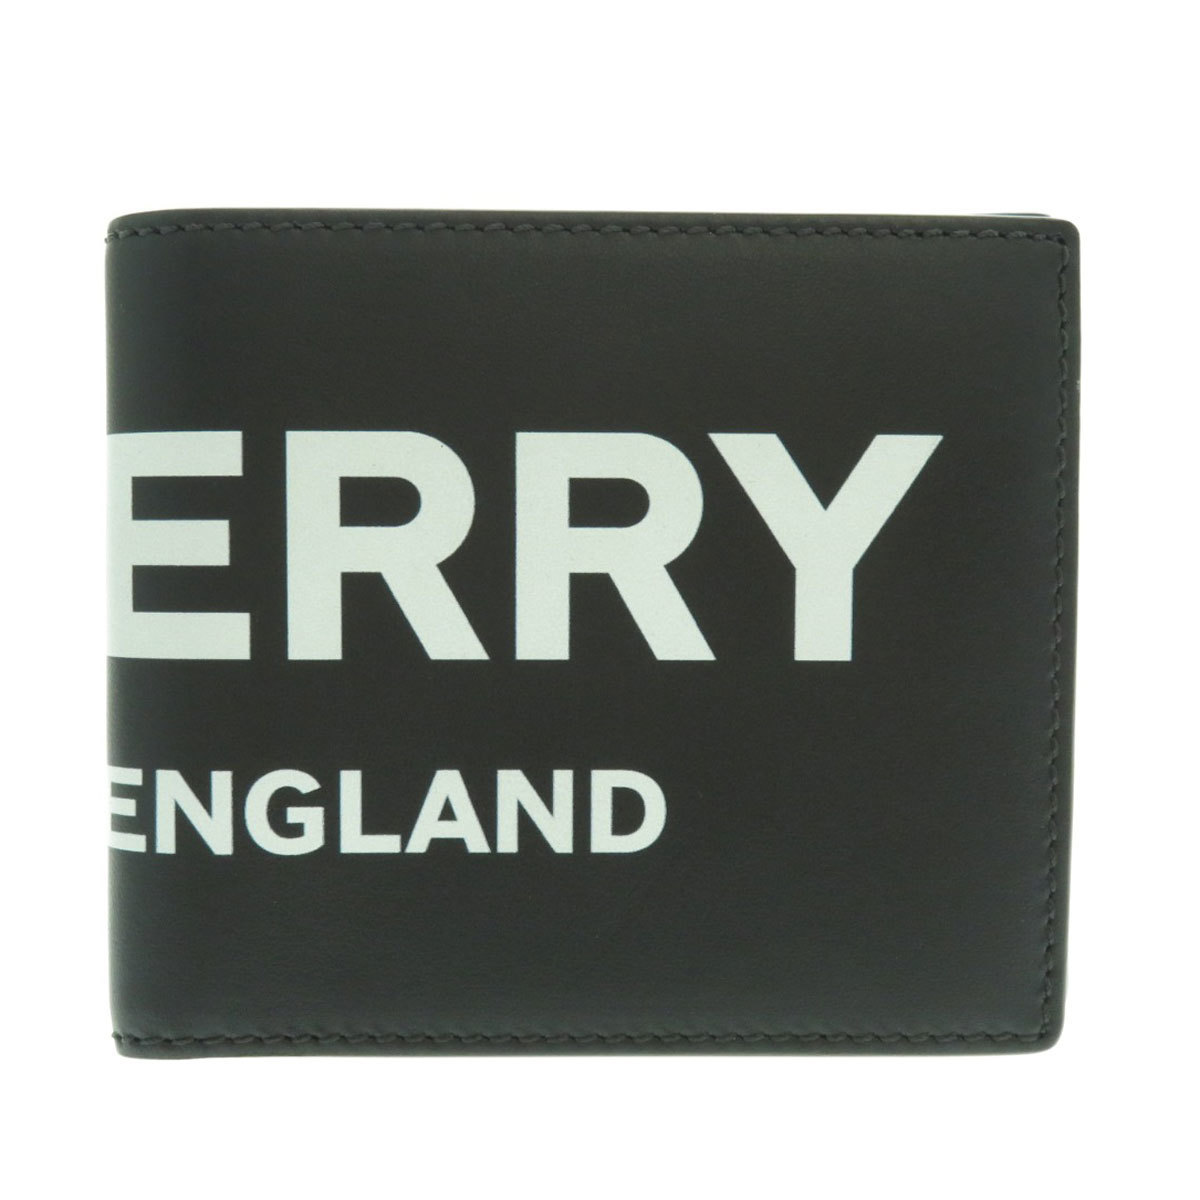 Burberry logo motif bi-fold wallet leather men's